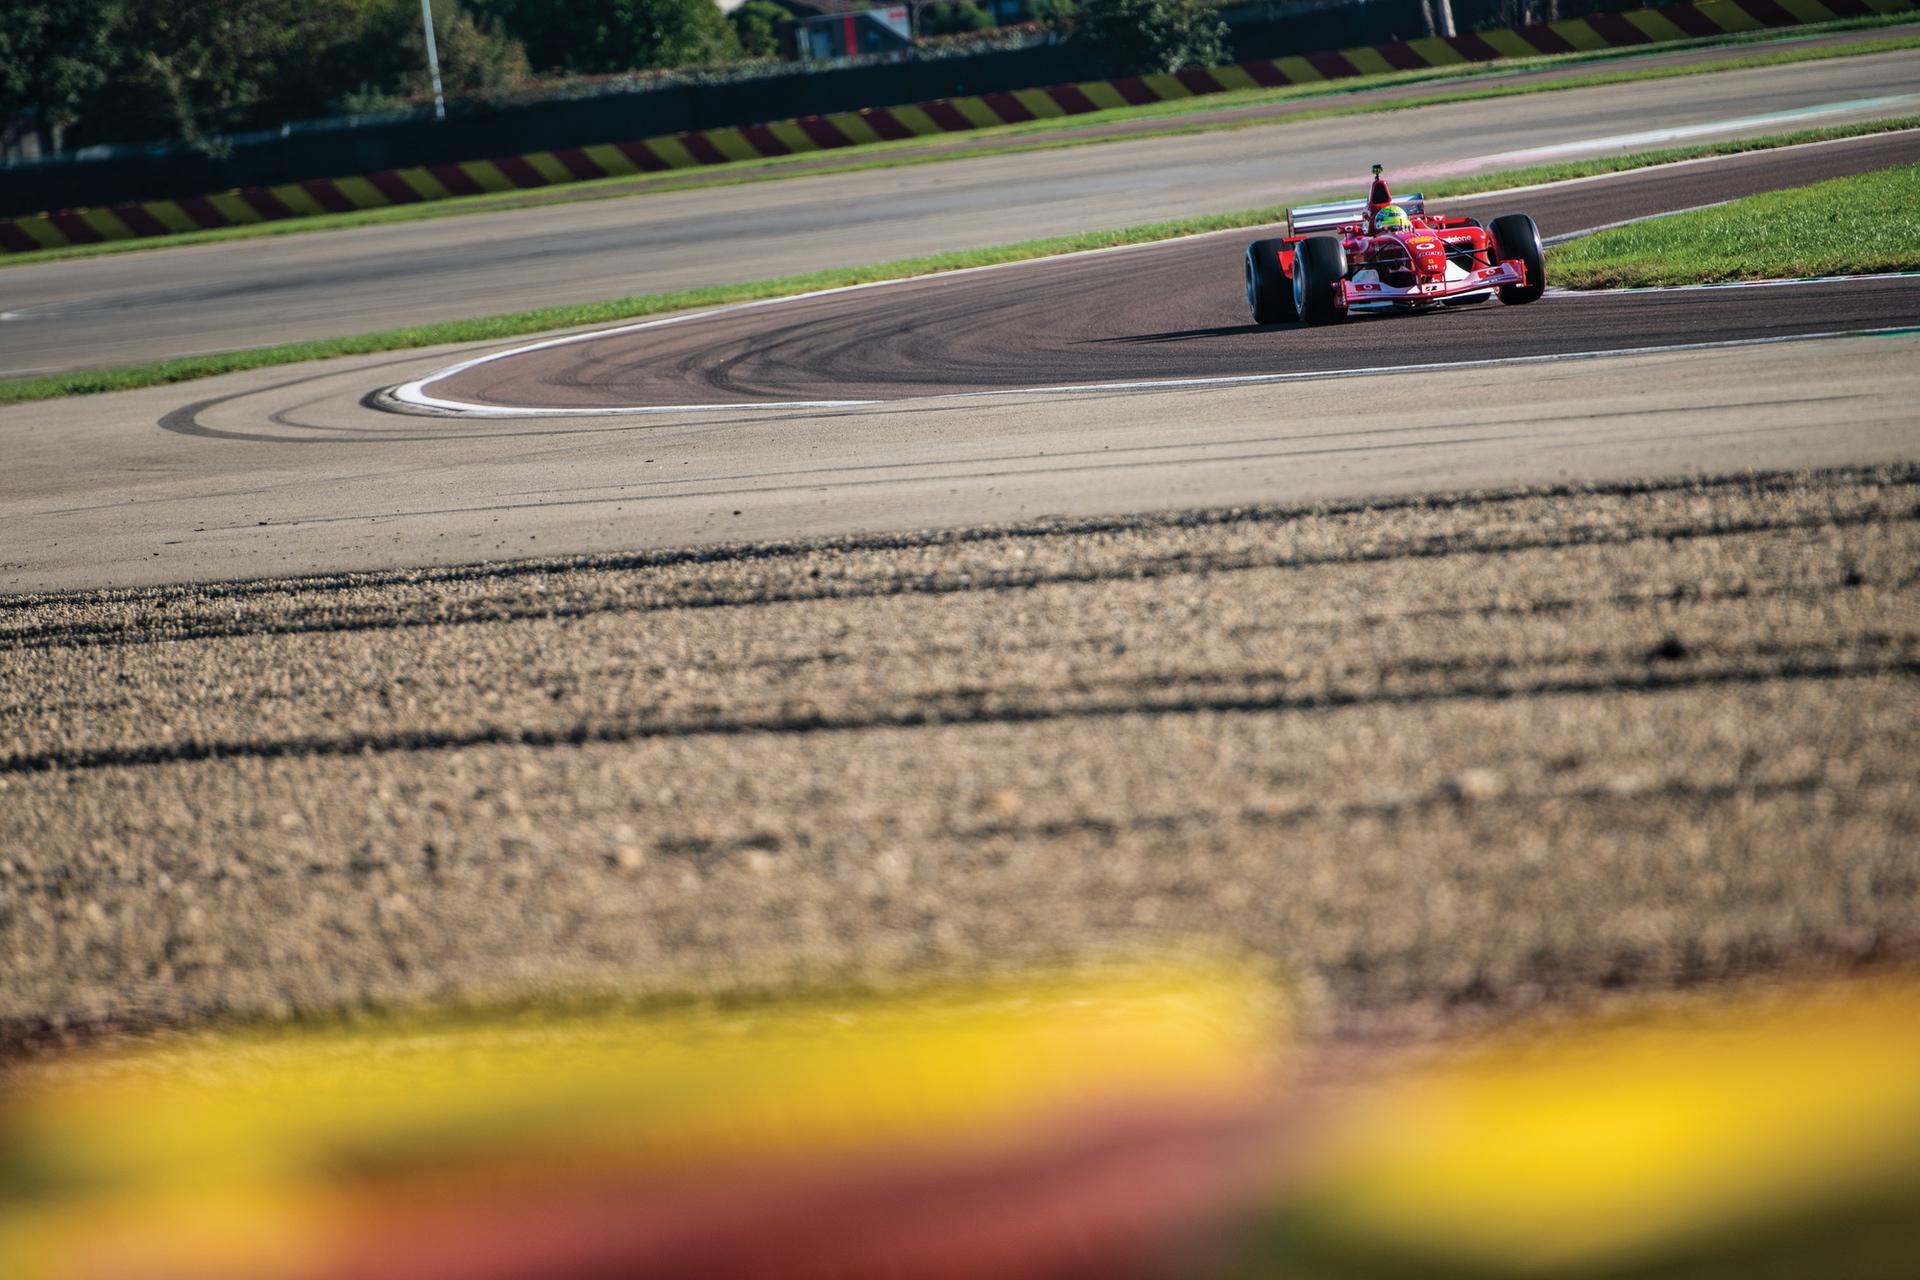 Mick_Schumacher_Ferrari_F2002_0016